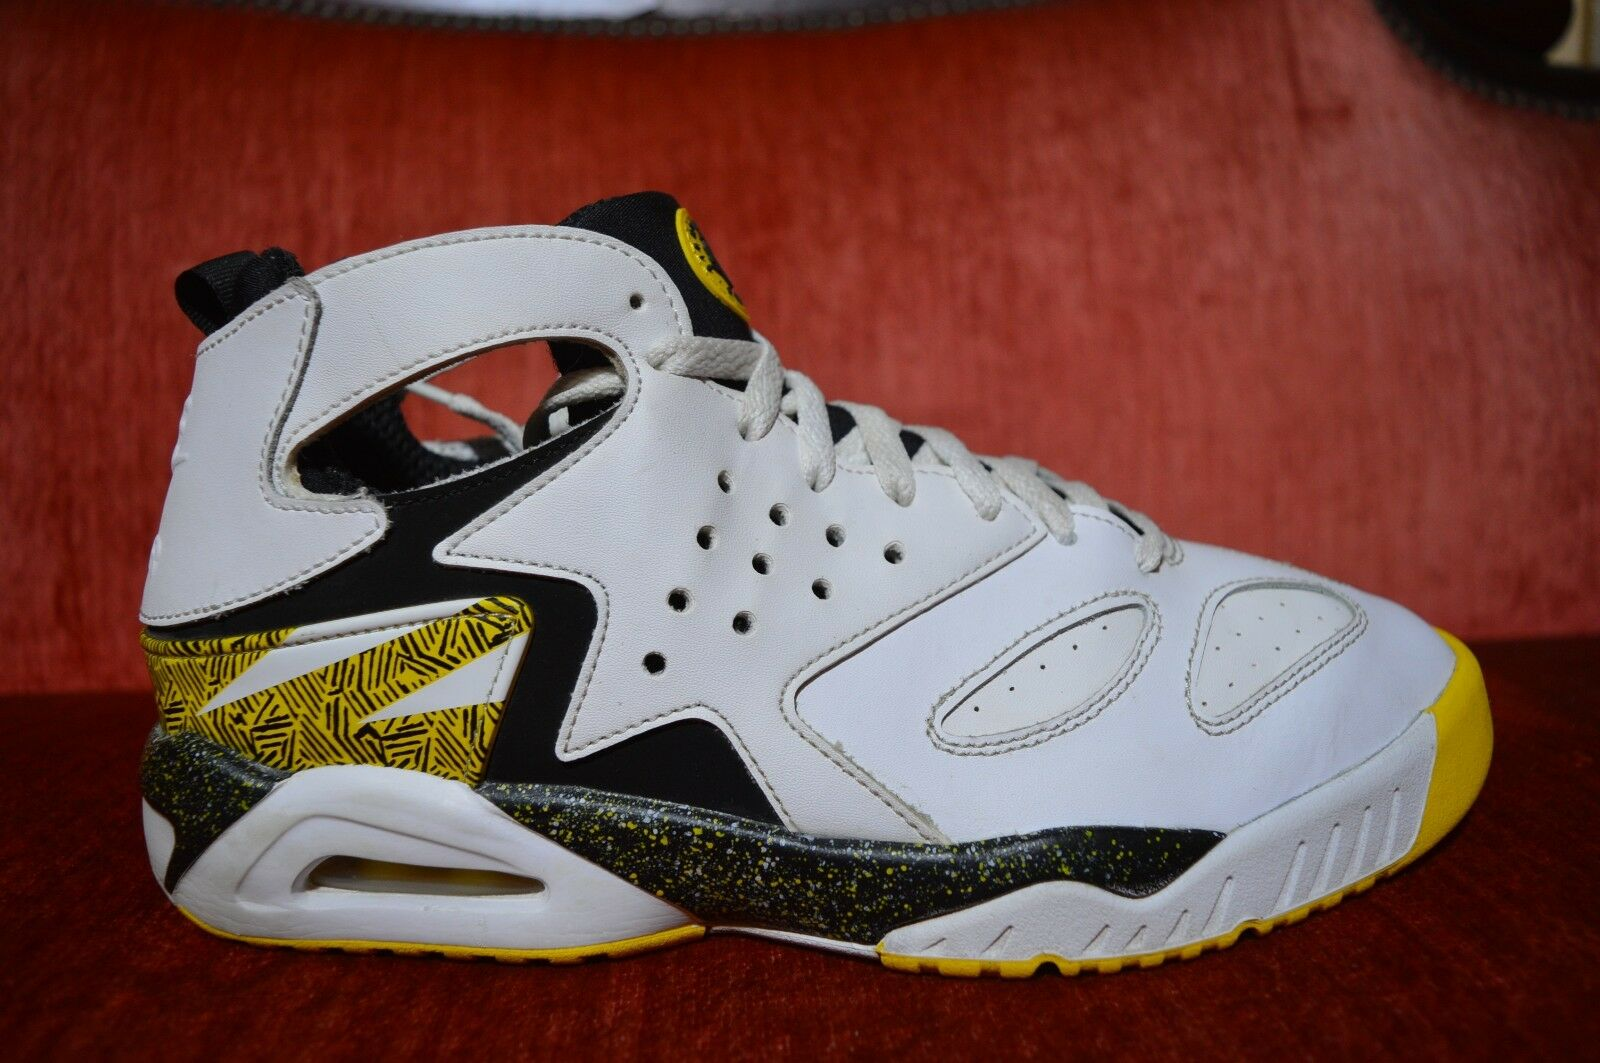 Nike Air Tech Challenge Huarache Run 630957-100 Tour Yellow Shoes Comfortable Wild casual shoes